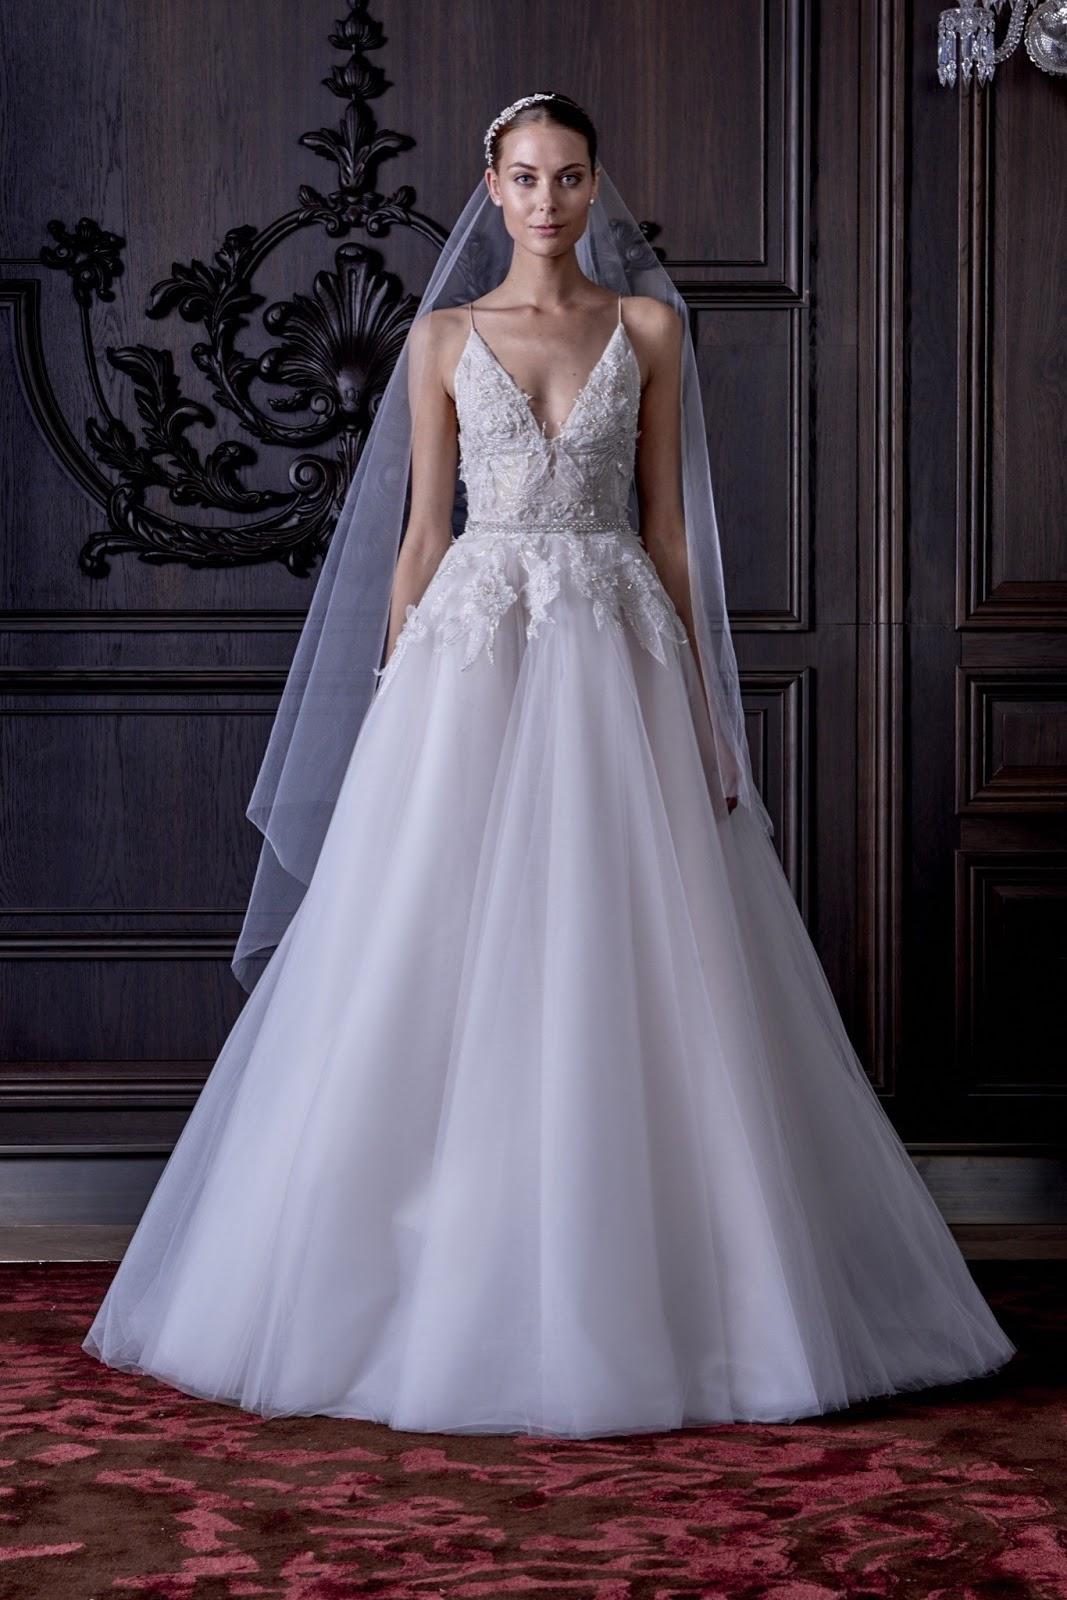 S.N.O.B.B.™ | Atlanta Wedding Blog